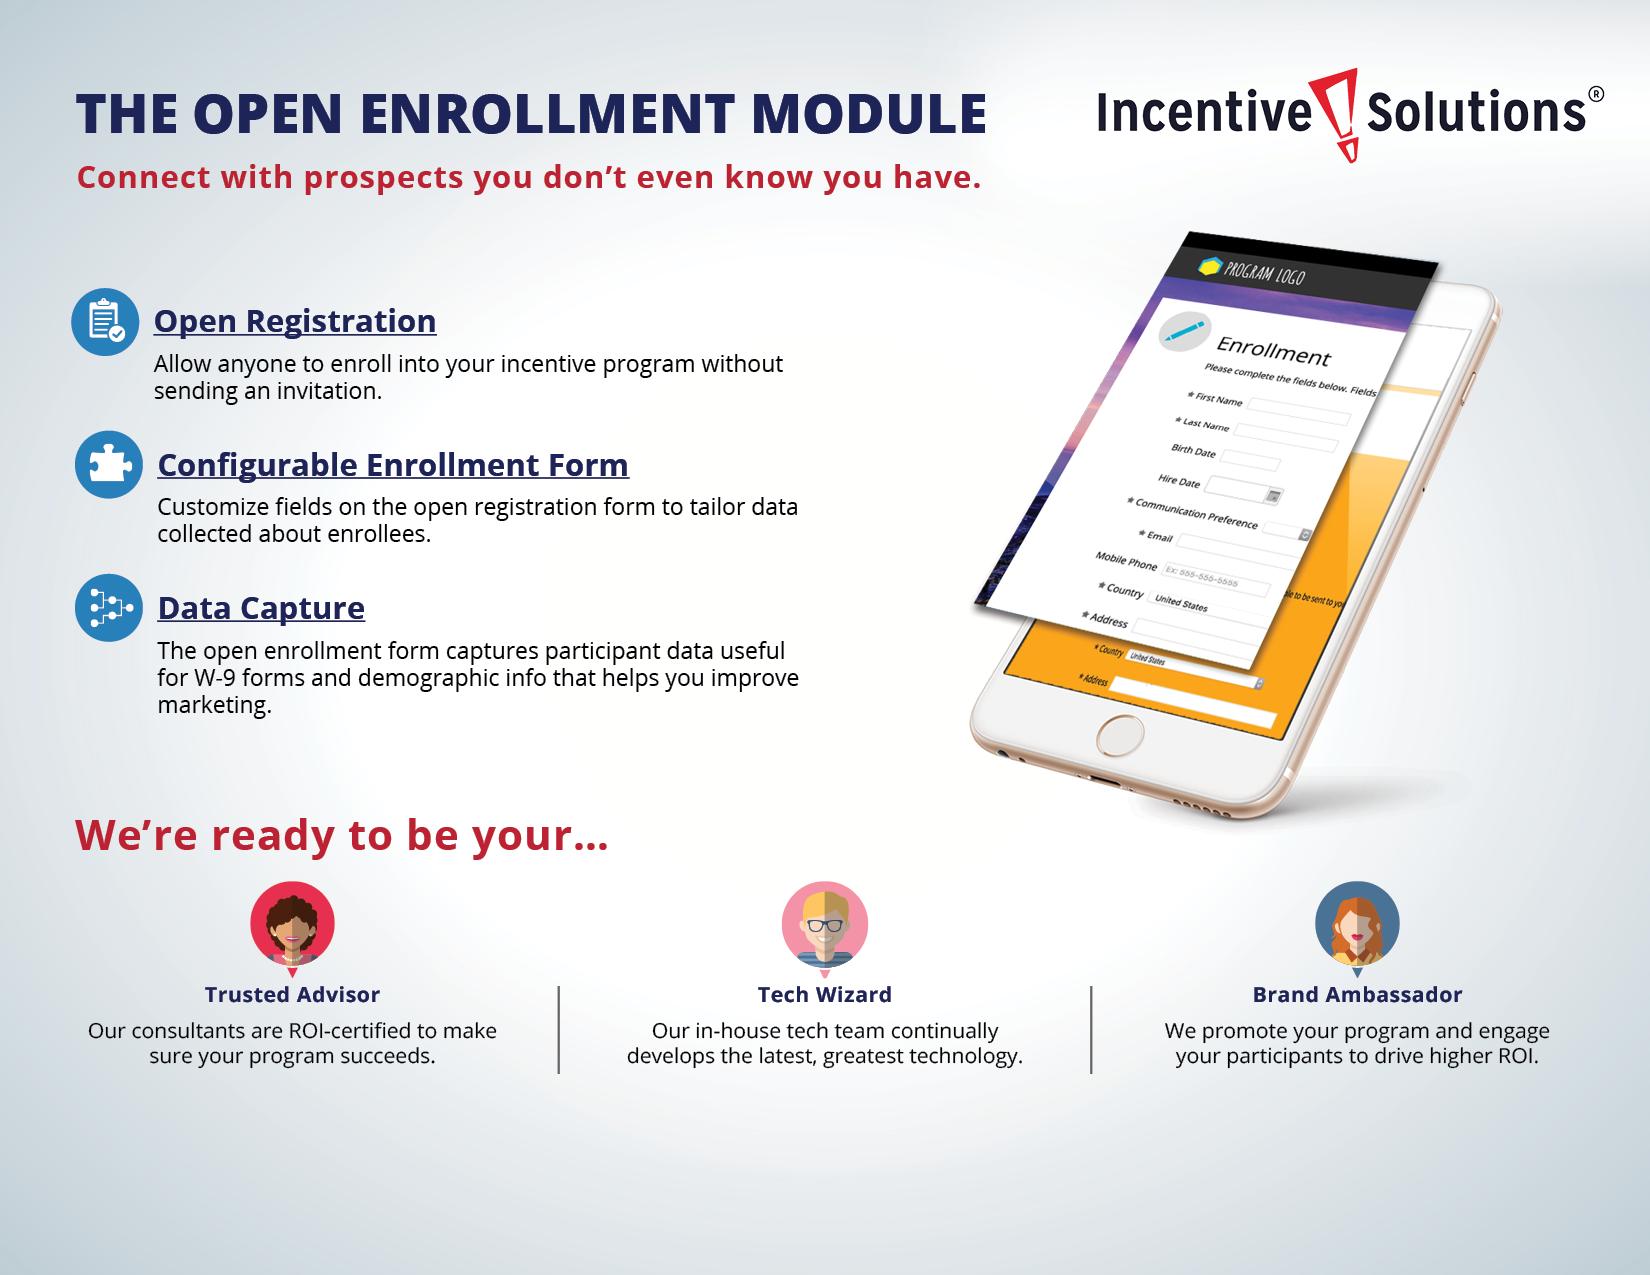 Open Enrollment incentive solutions sales sheet